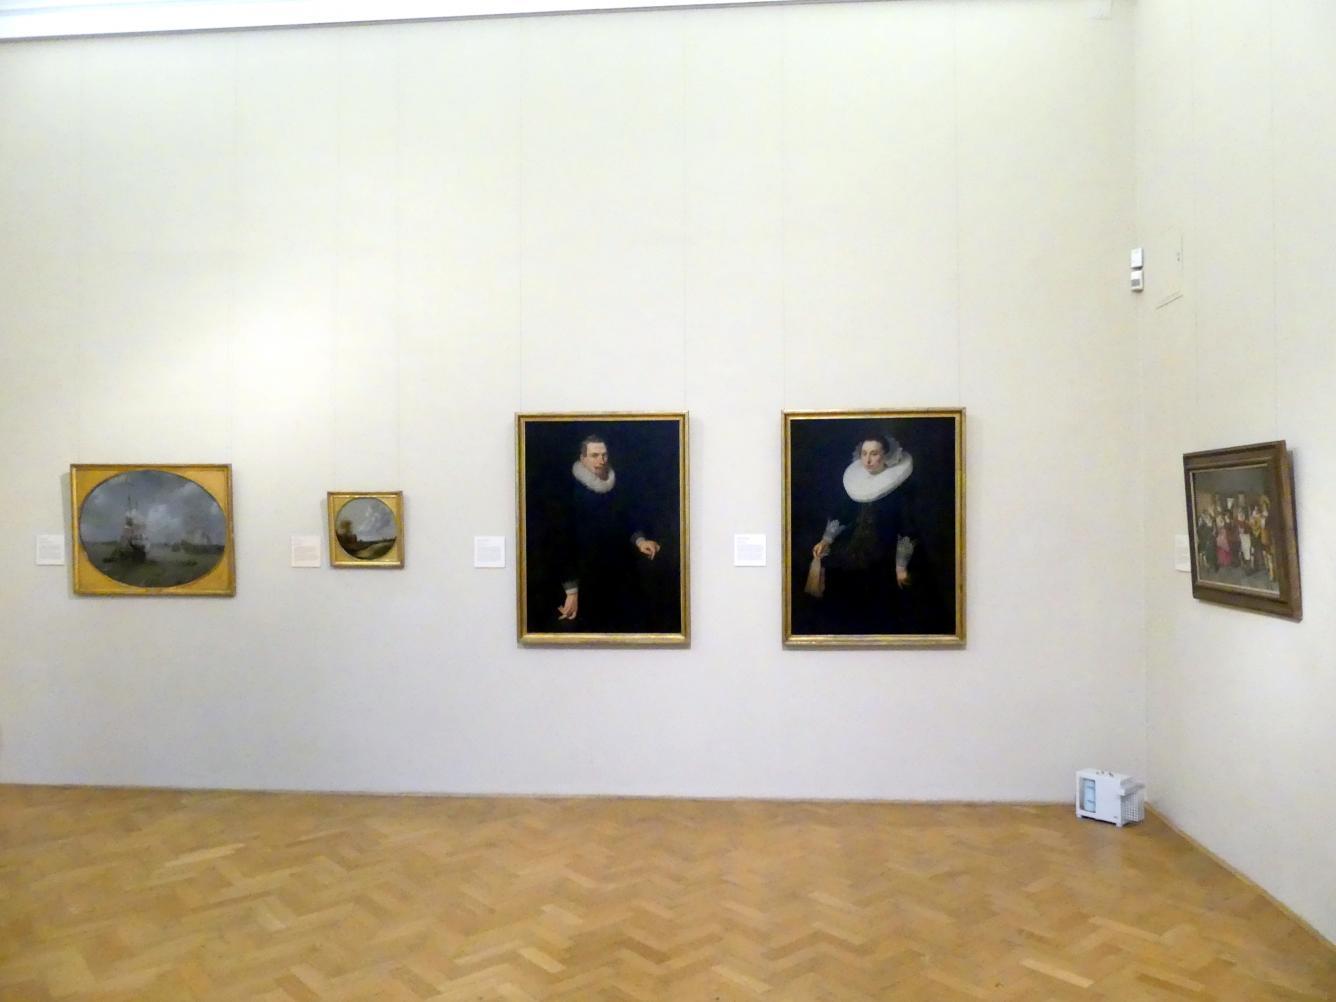 Prag, Nationalgalerie im Palais Sternberg, 2. Obergeschoss, Saal 1, Bild 1/3